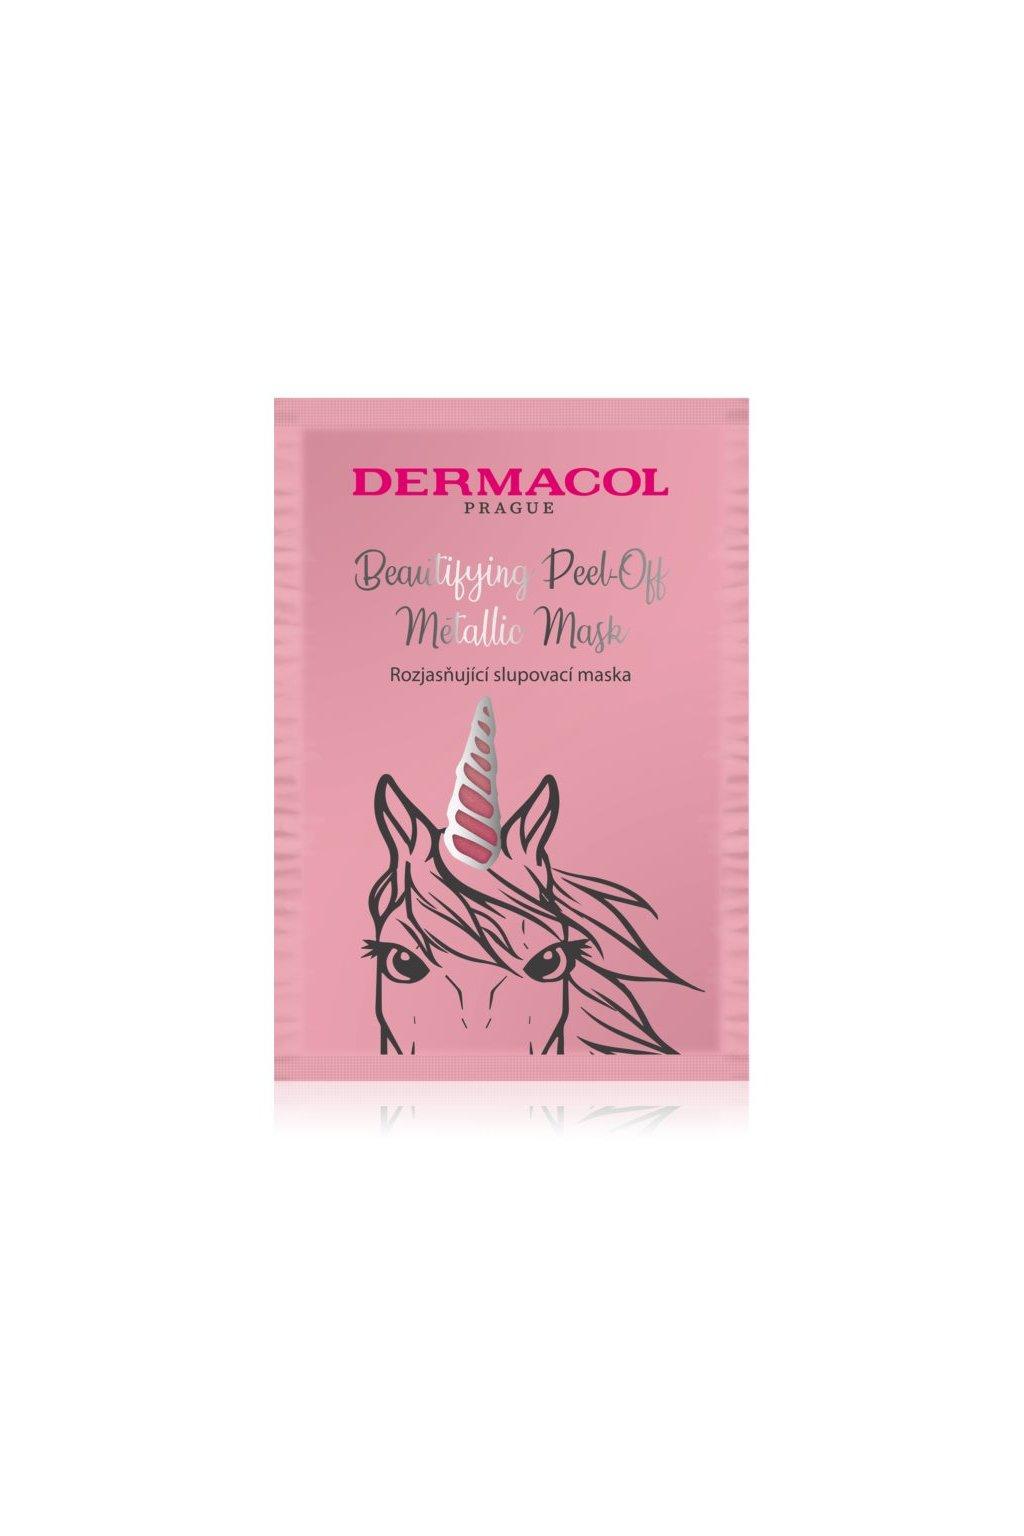 dermacol beautifying peel off metallic mask slupovaci maska pro rozjasneni pleti